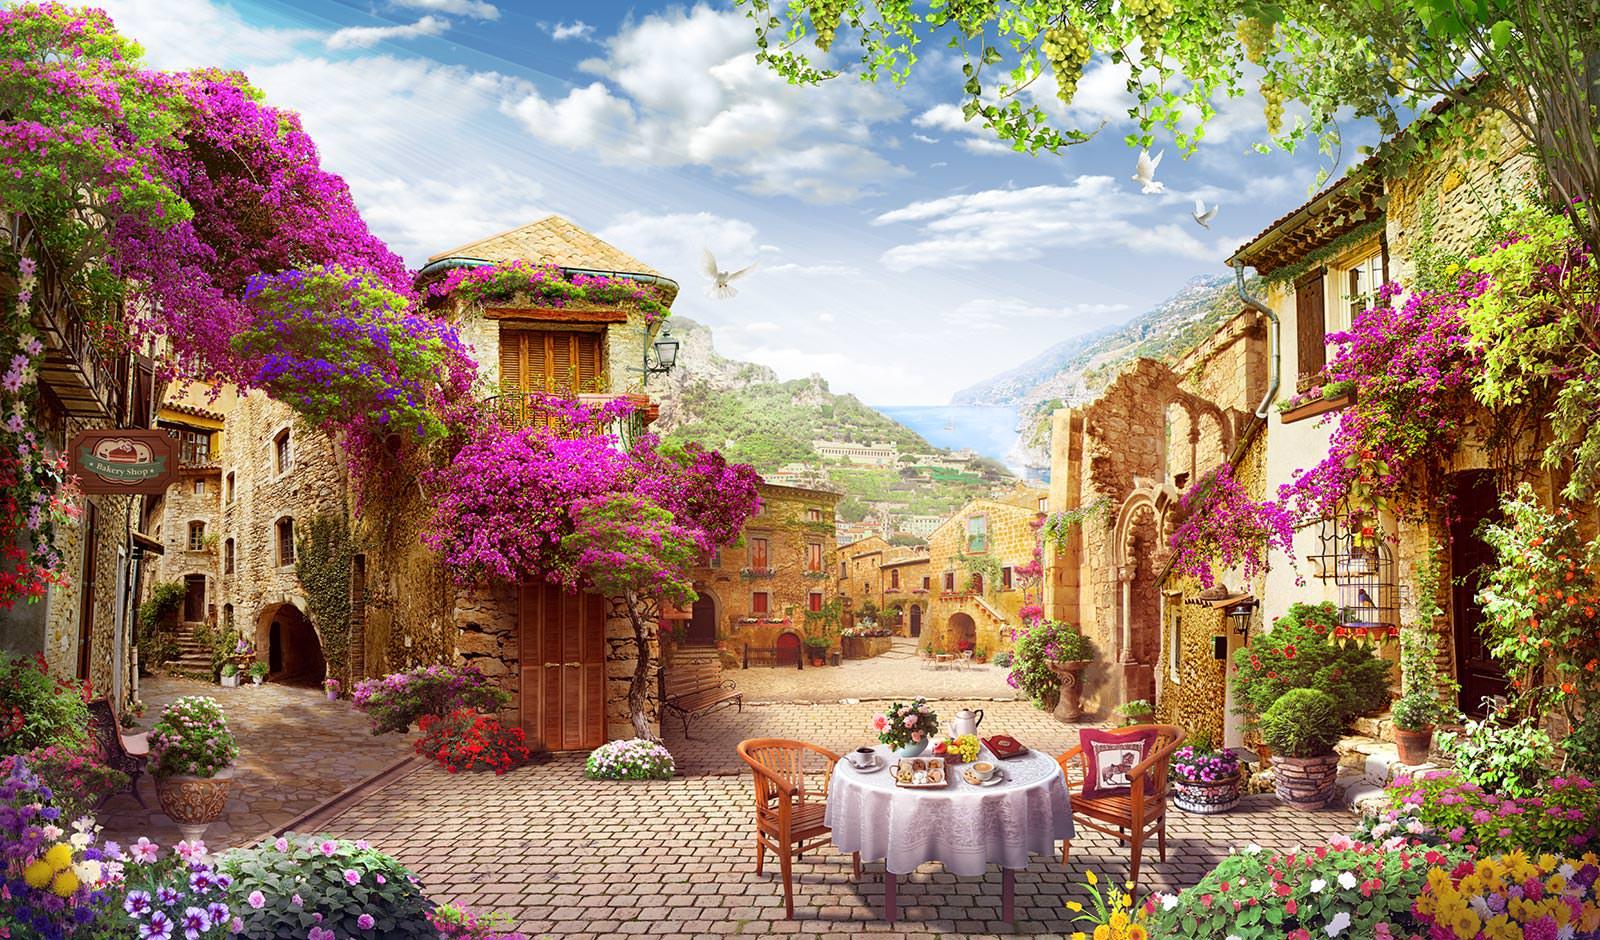 Фотообои улочка с цветами